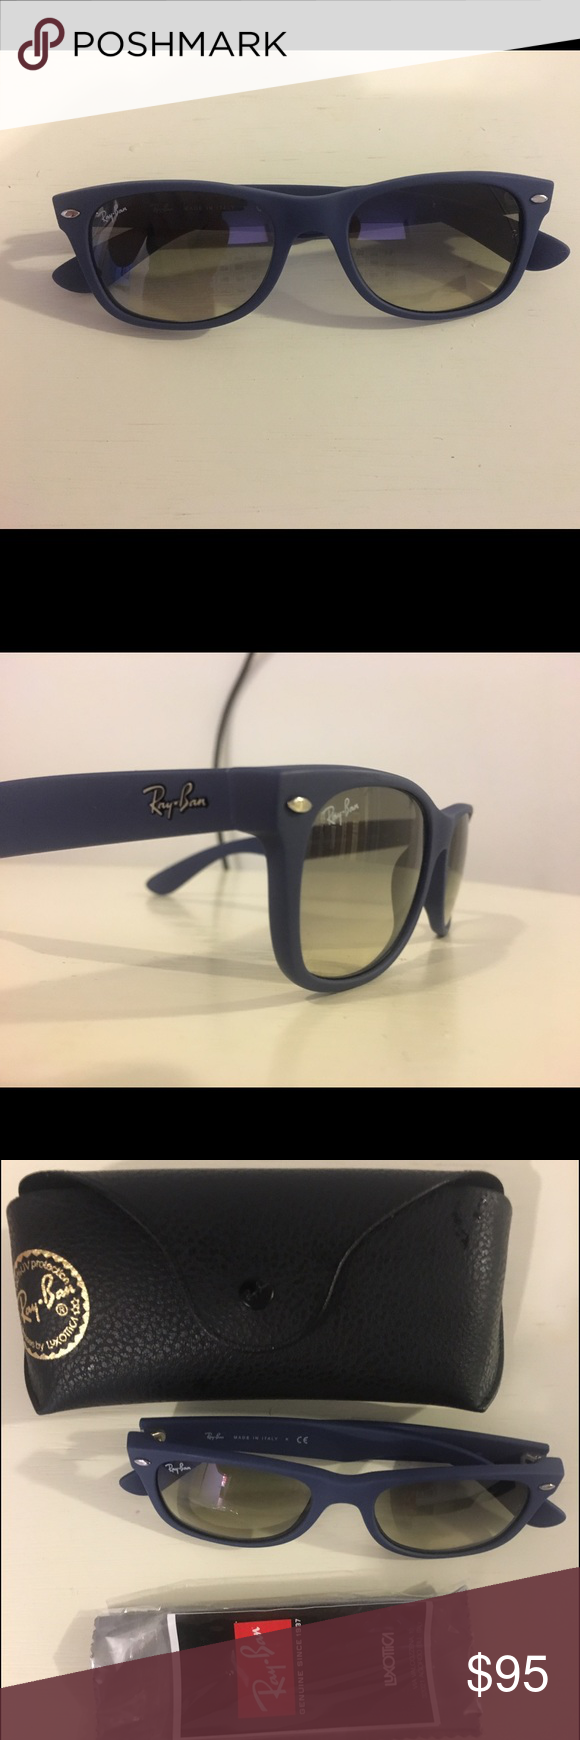 1a4edb7b03132 New Wayfarer Color Splash. Material  Blue Rubber Matte. Lenses  Light Grey  Gradient. Size  52018. Model Code  RB2132 New Wayfarer 811 32 Ray-Ban  Accessories ...